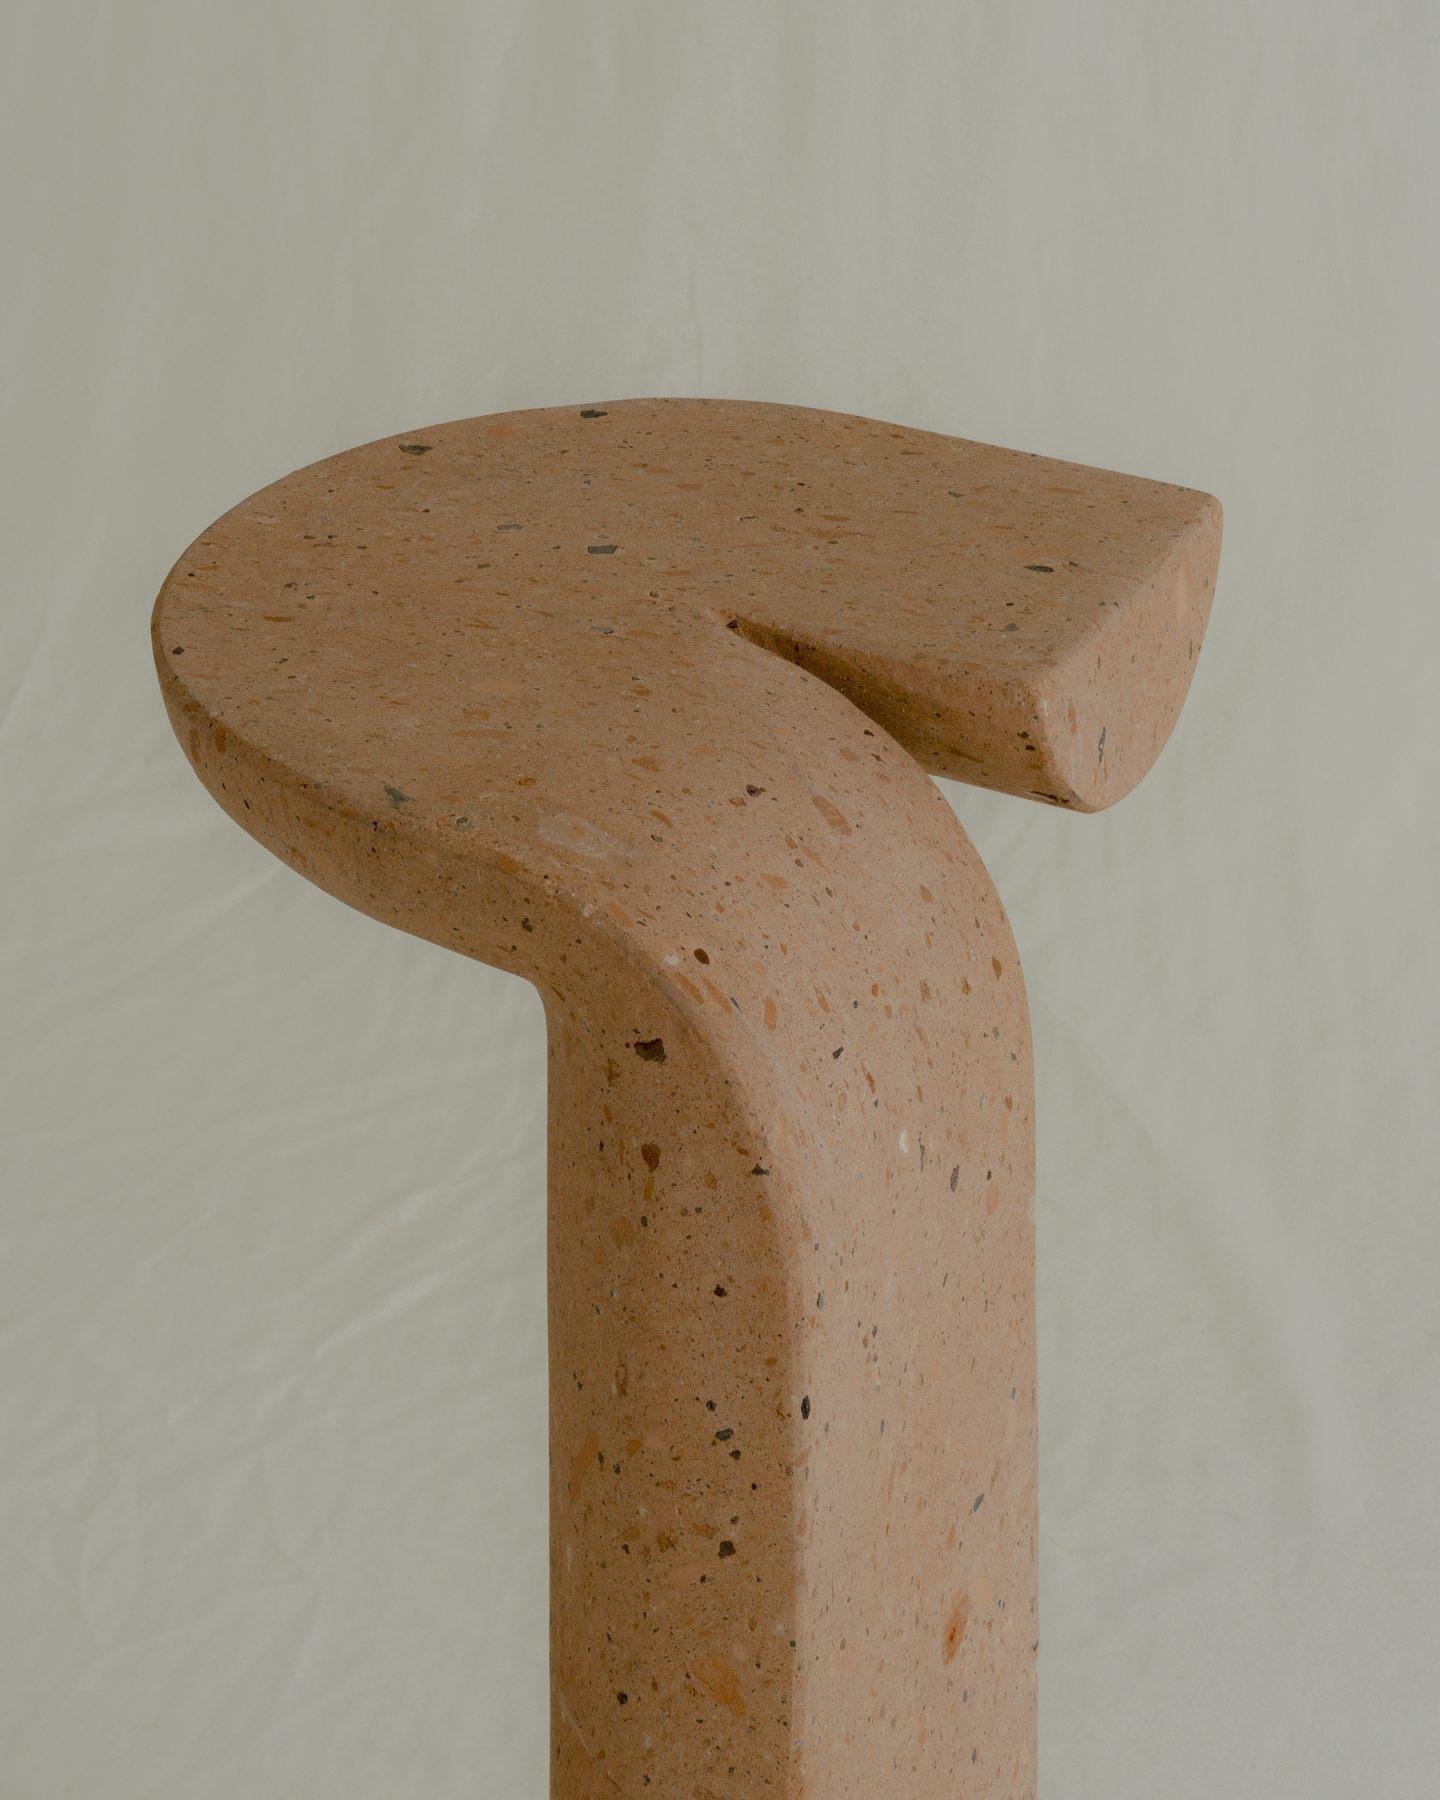 IGNANT-Design-Ian-Felton-Kosa-13